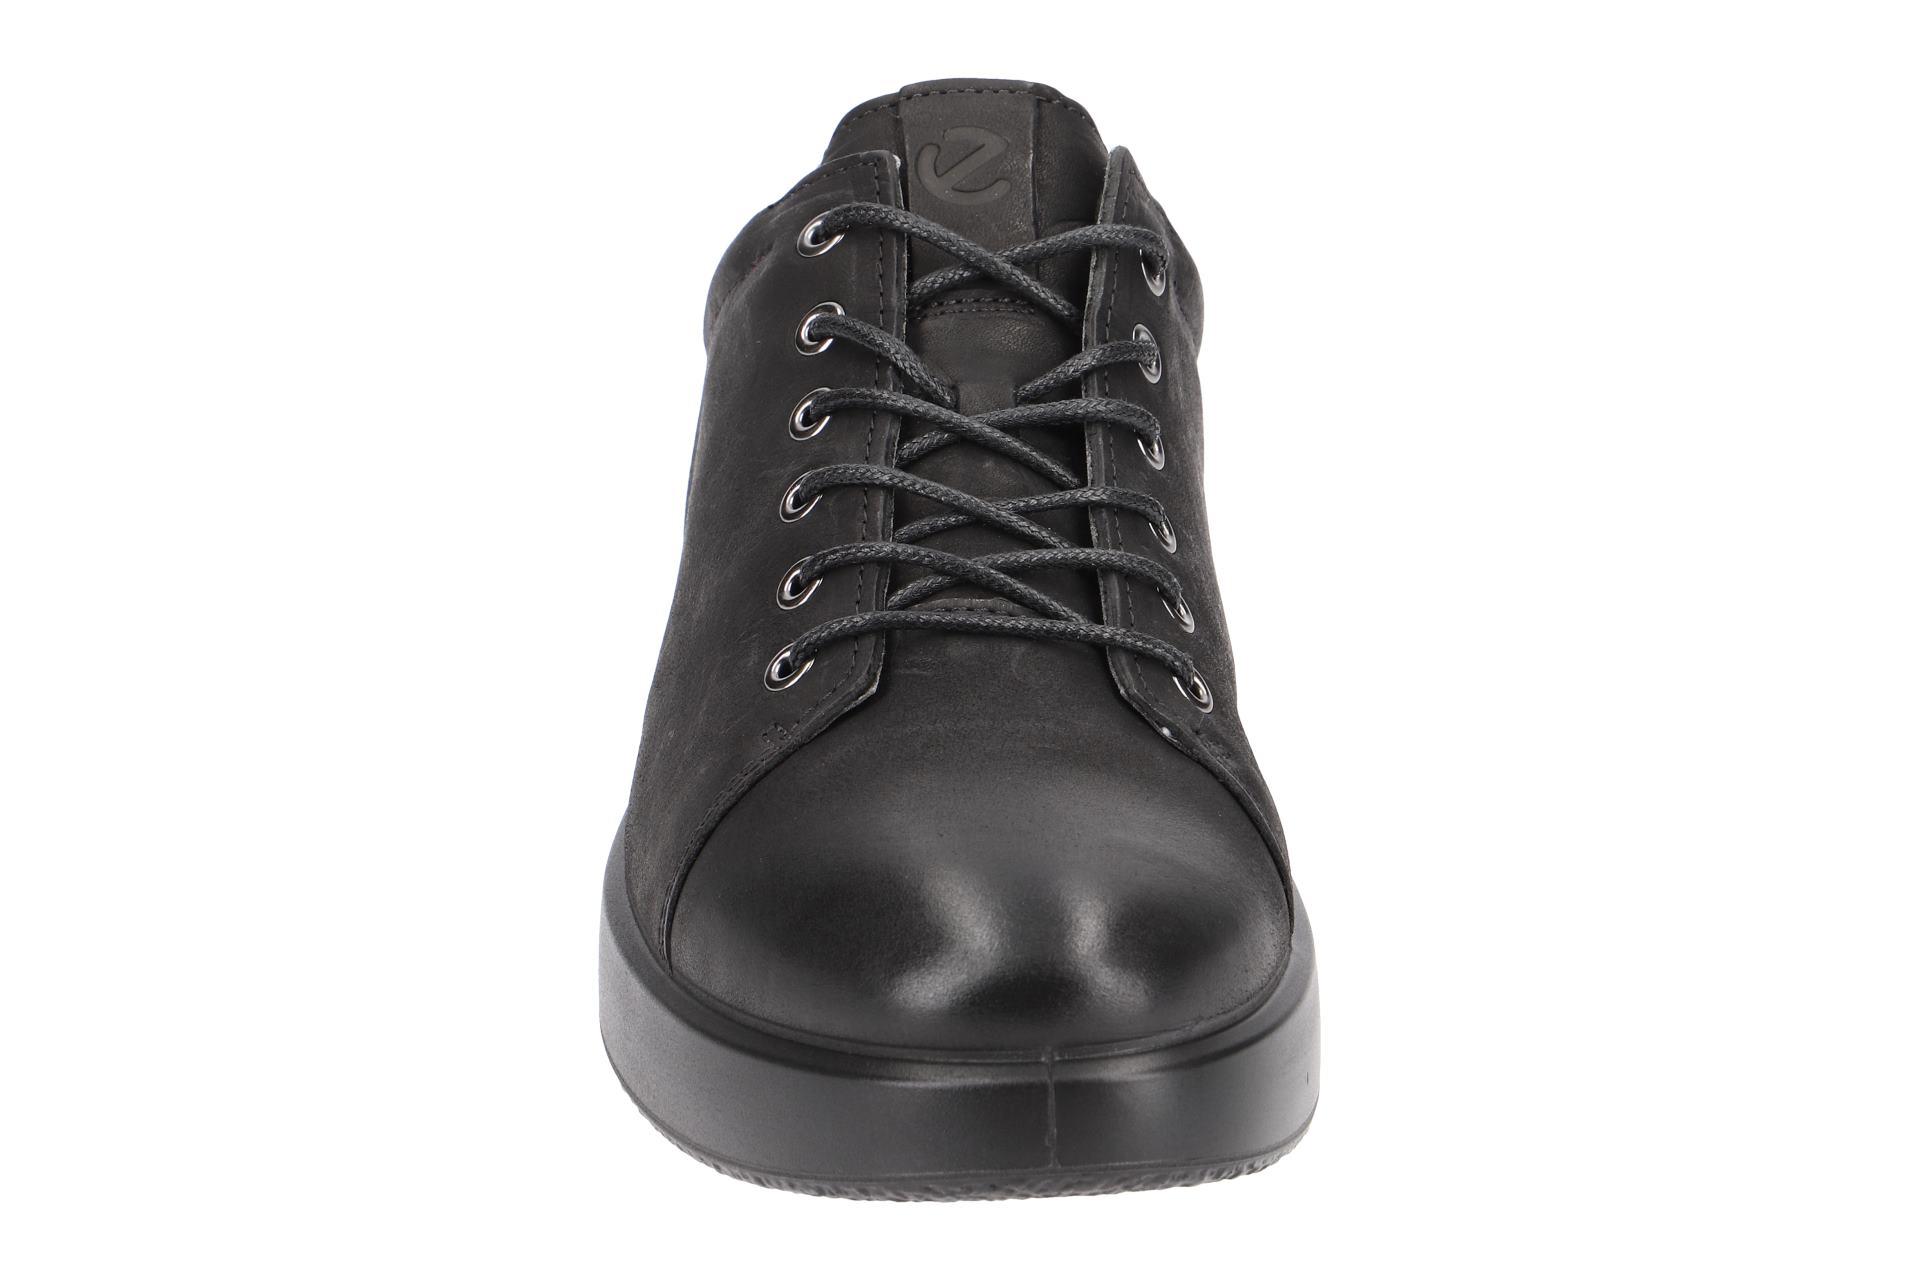 Details zu Ecco Schuhe CORKSPHERE 1 MENS schwarz Herrenschuhe 27120401001 NEU